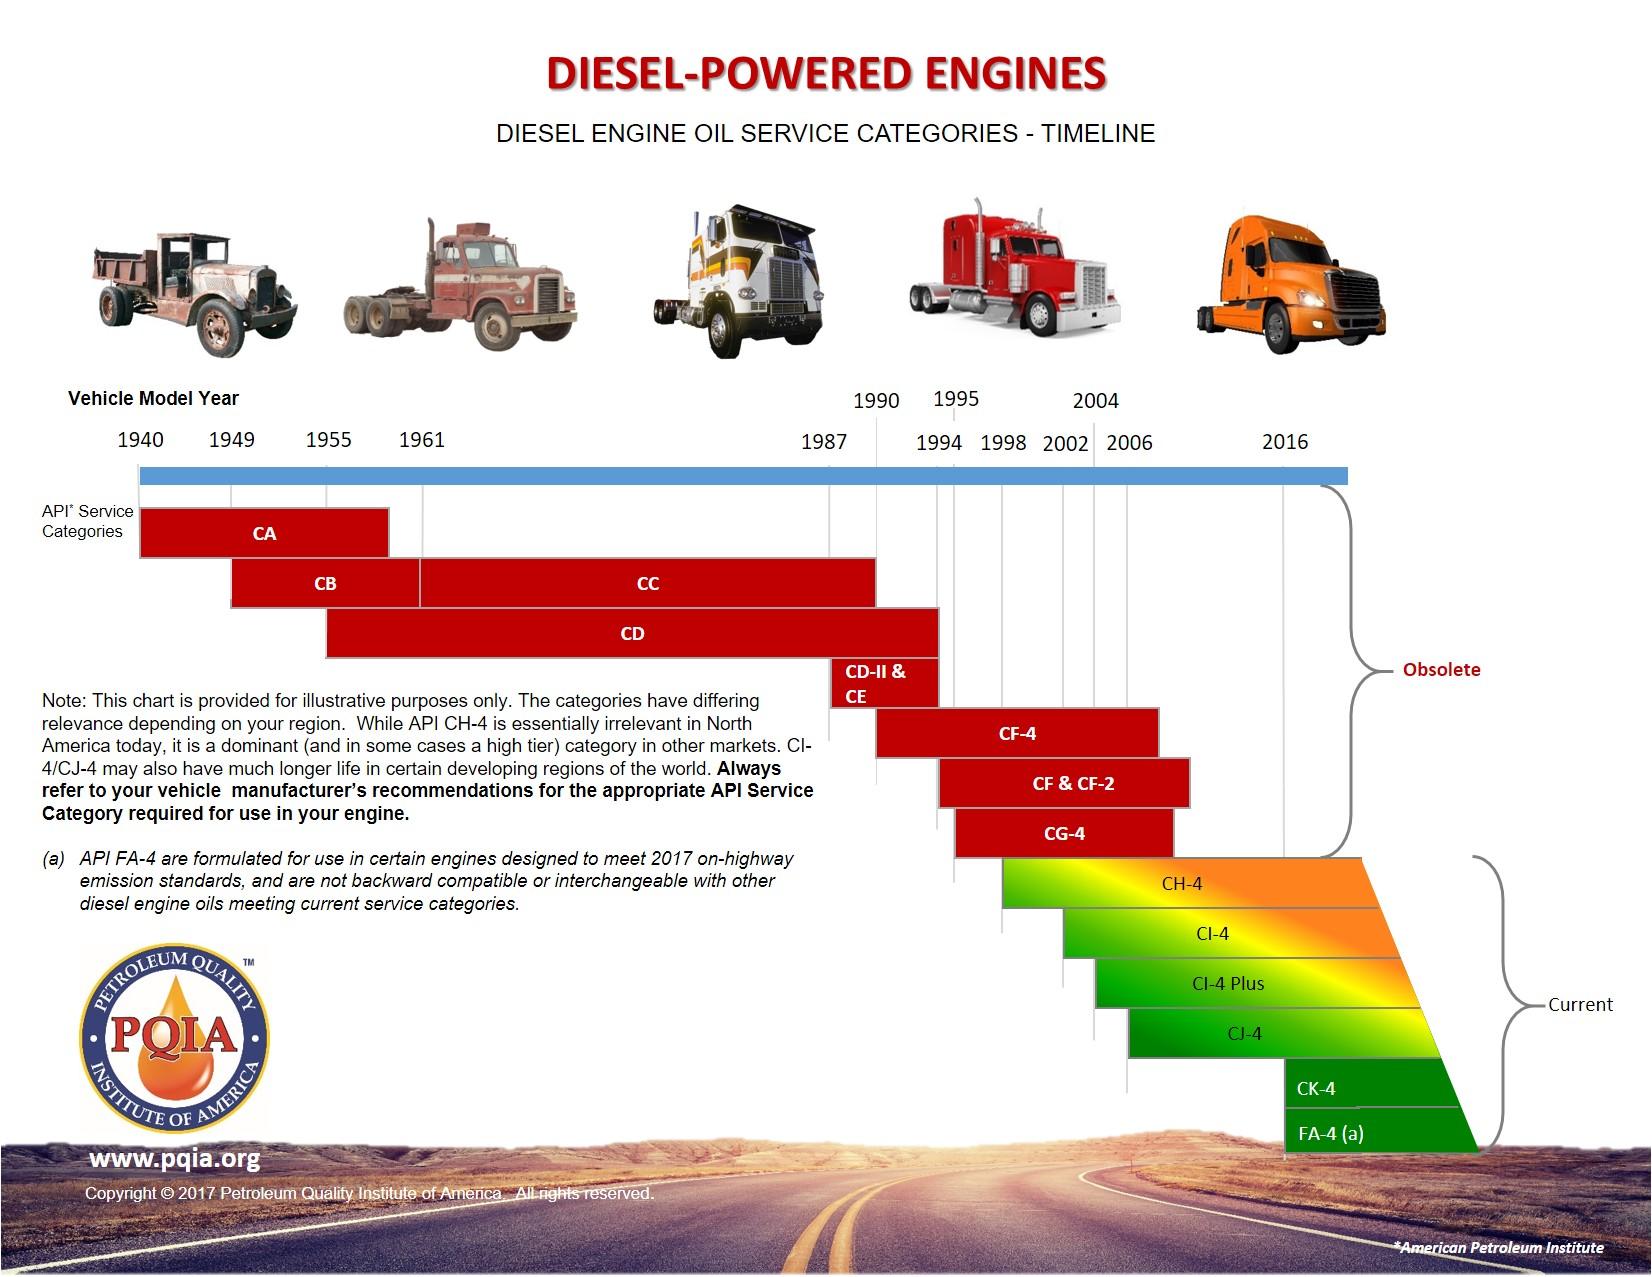 Lubricating Oil Matters Goff's Equipment Service, Inc  Litchfield